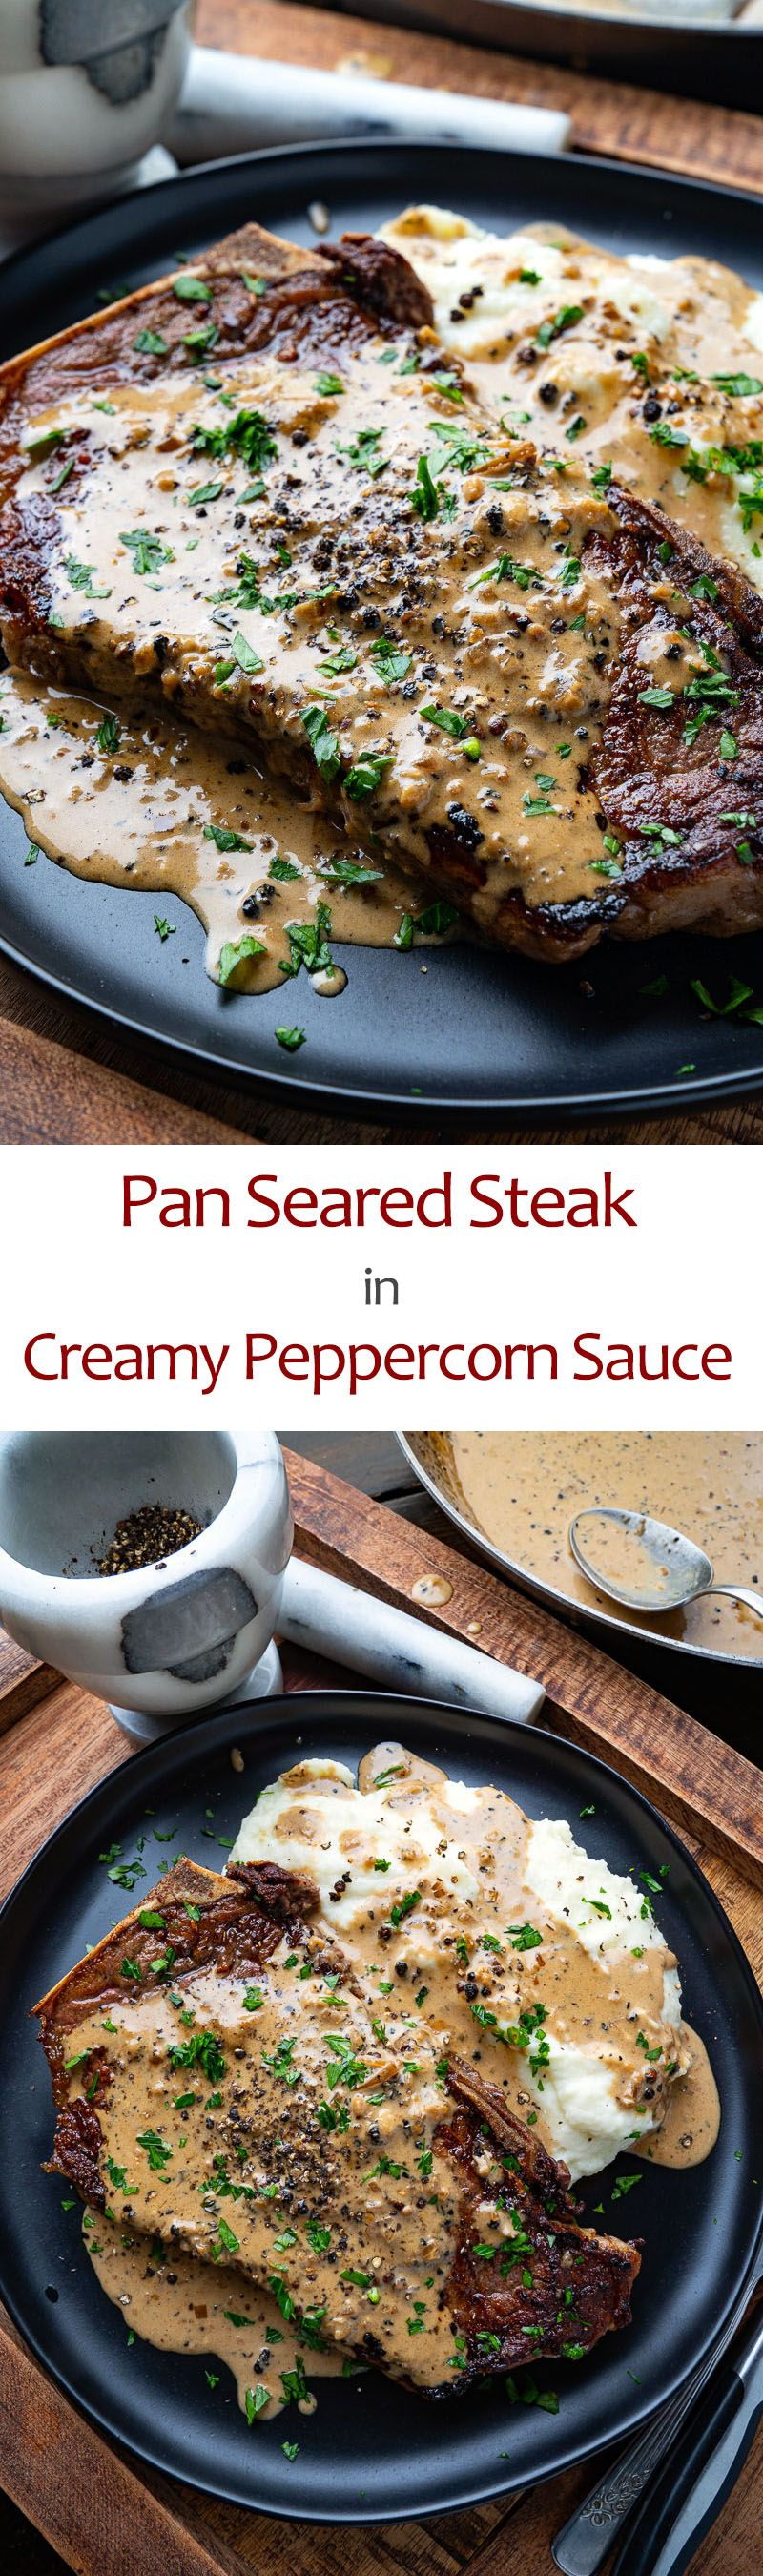 Pan Seared Steak in Creamy Peppercorn Sauce